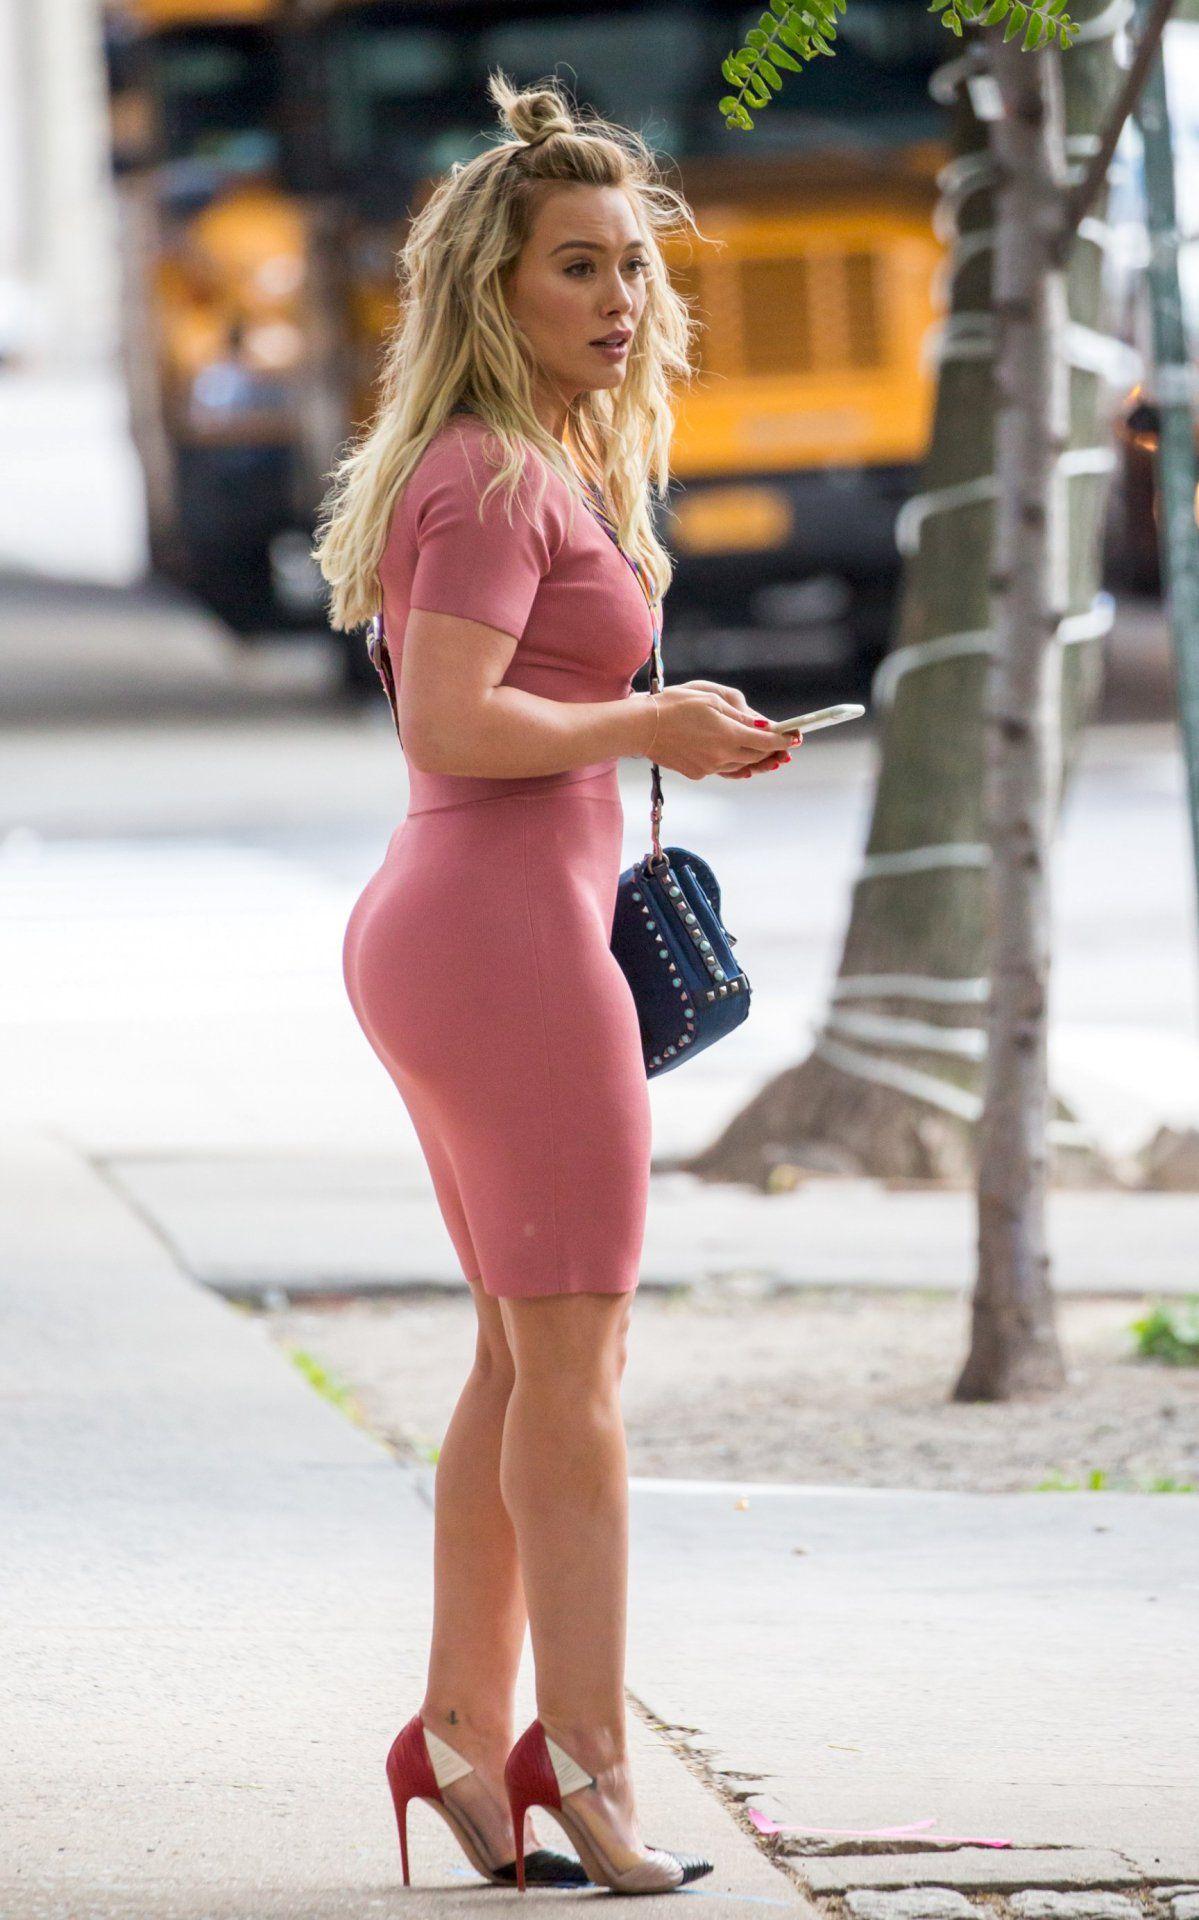 Life. Hilary duff sexy tight dress opinion